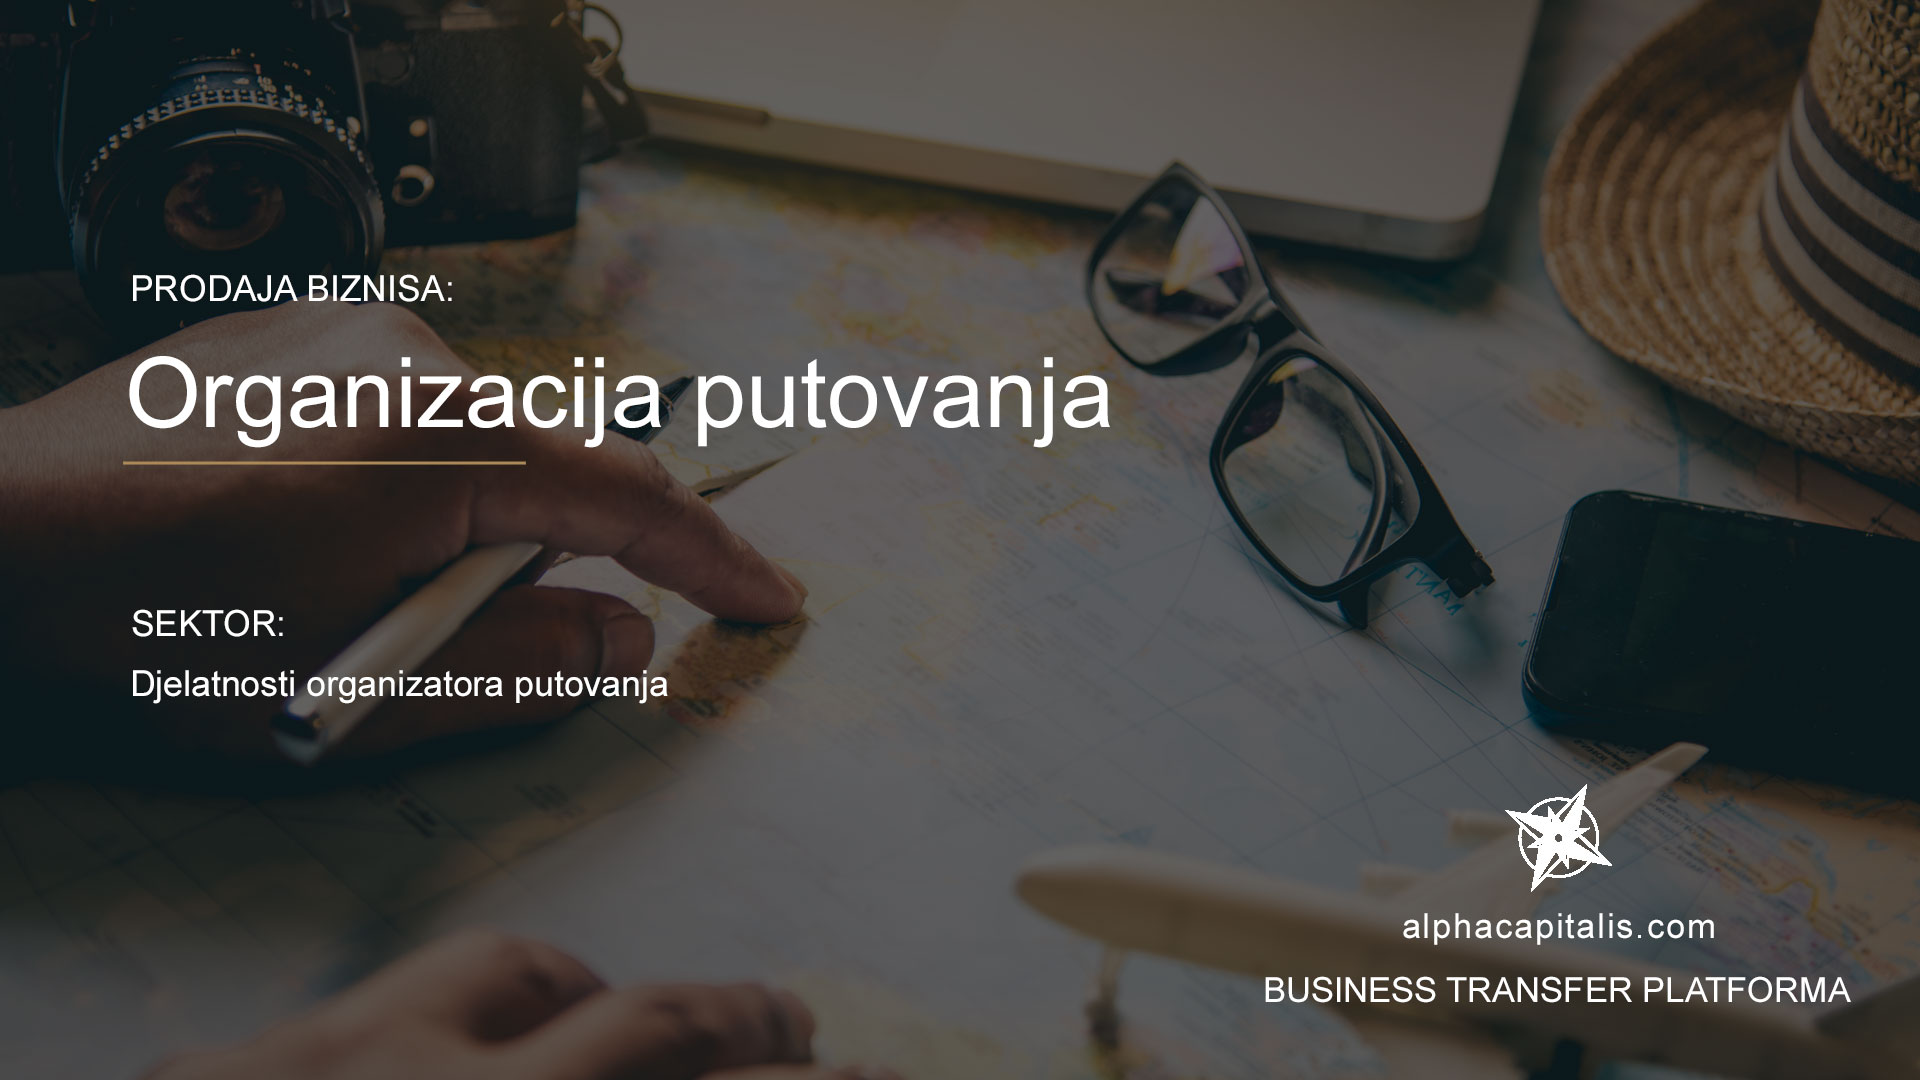 Alpha-Capitalis-Business-Transfer-Platforma_Prodaja-biznisa-organizacija-putovanja